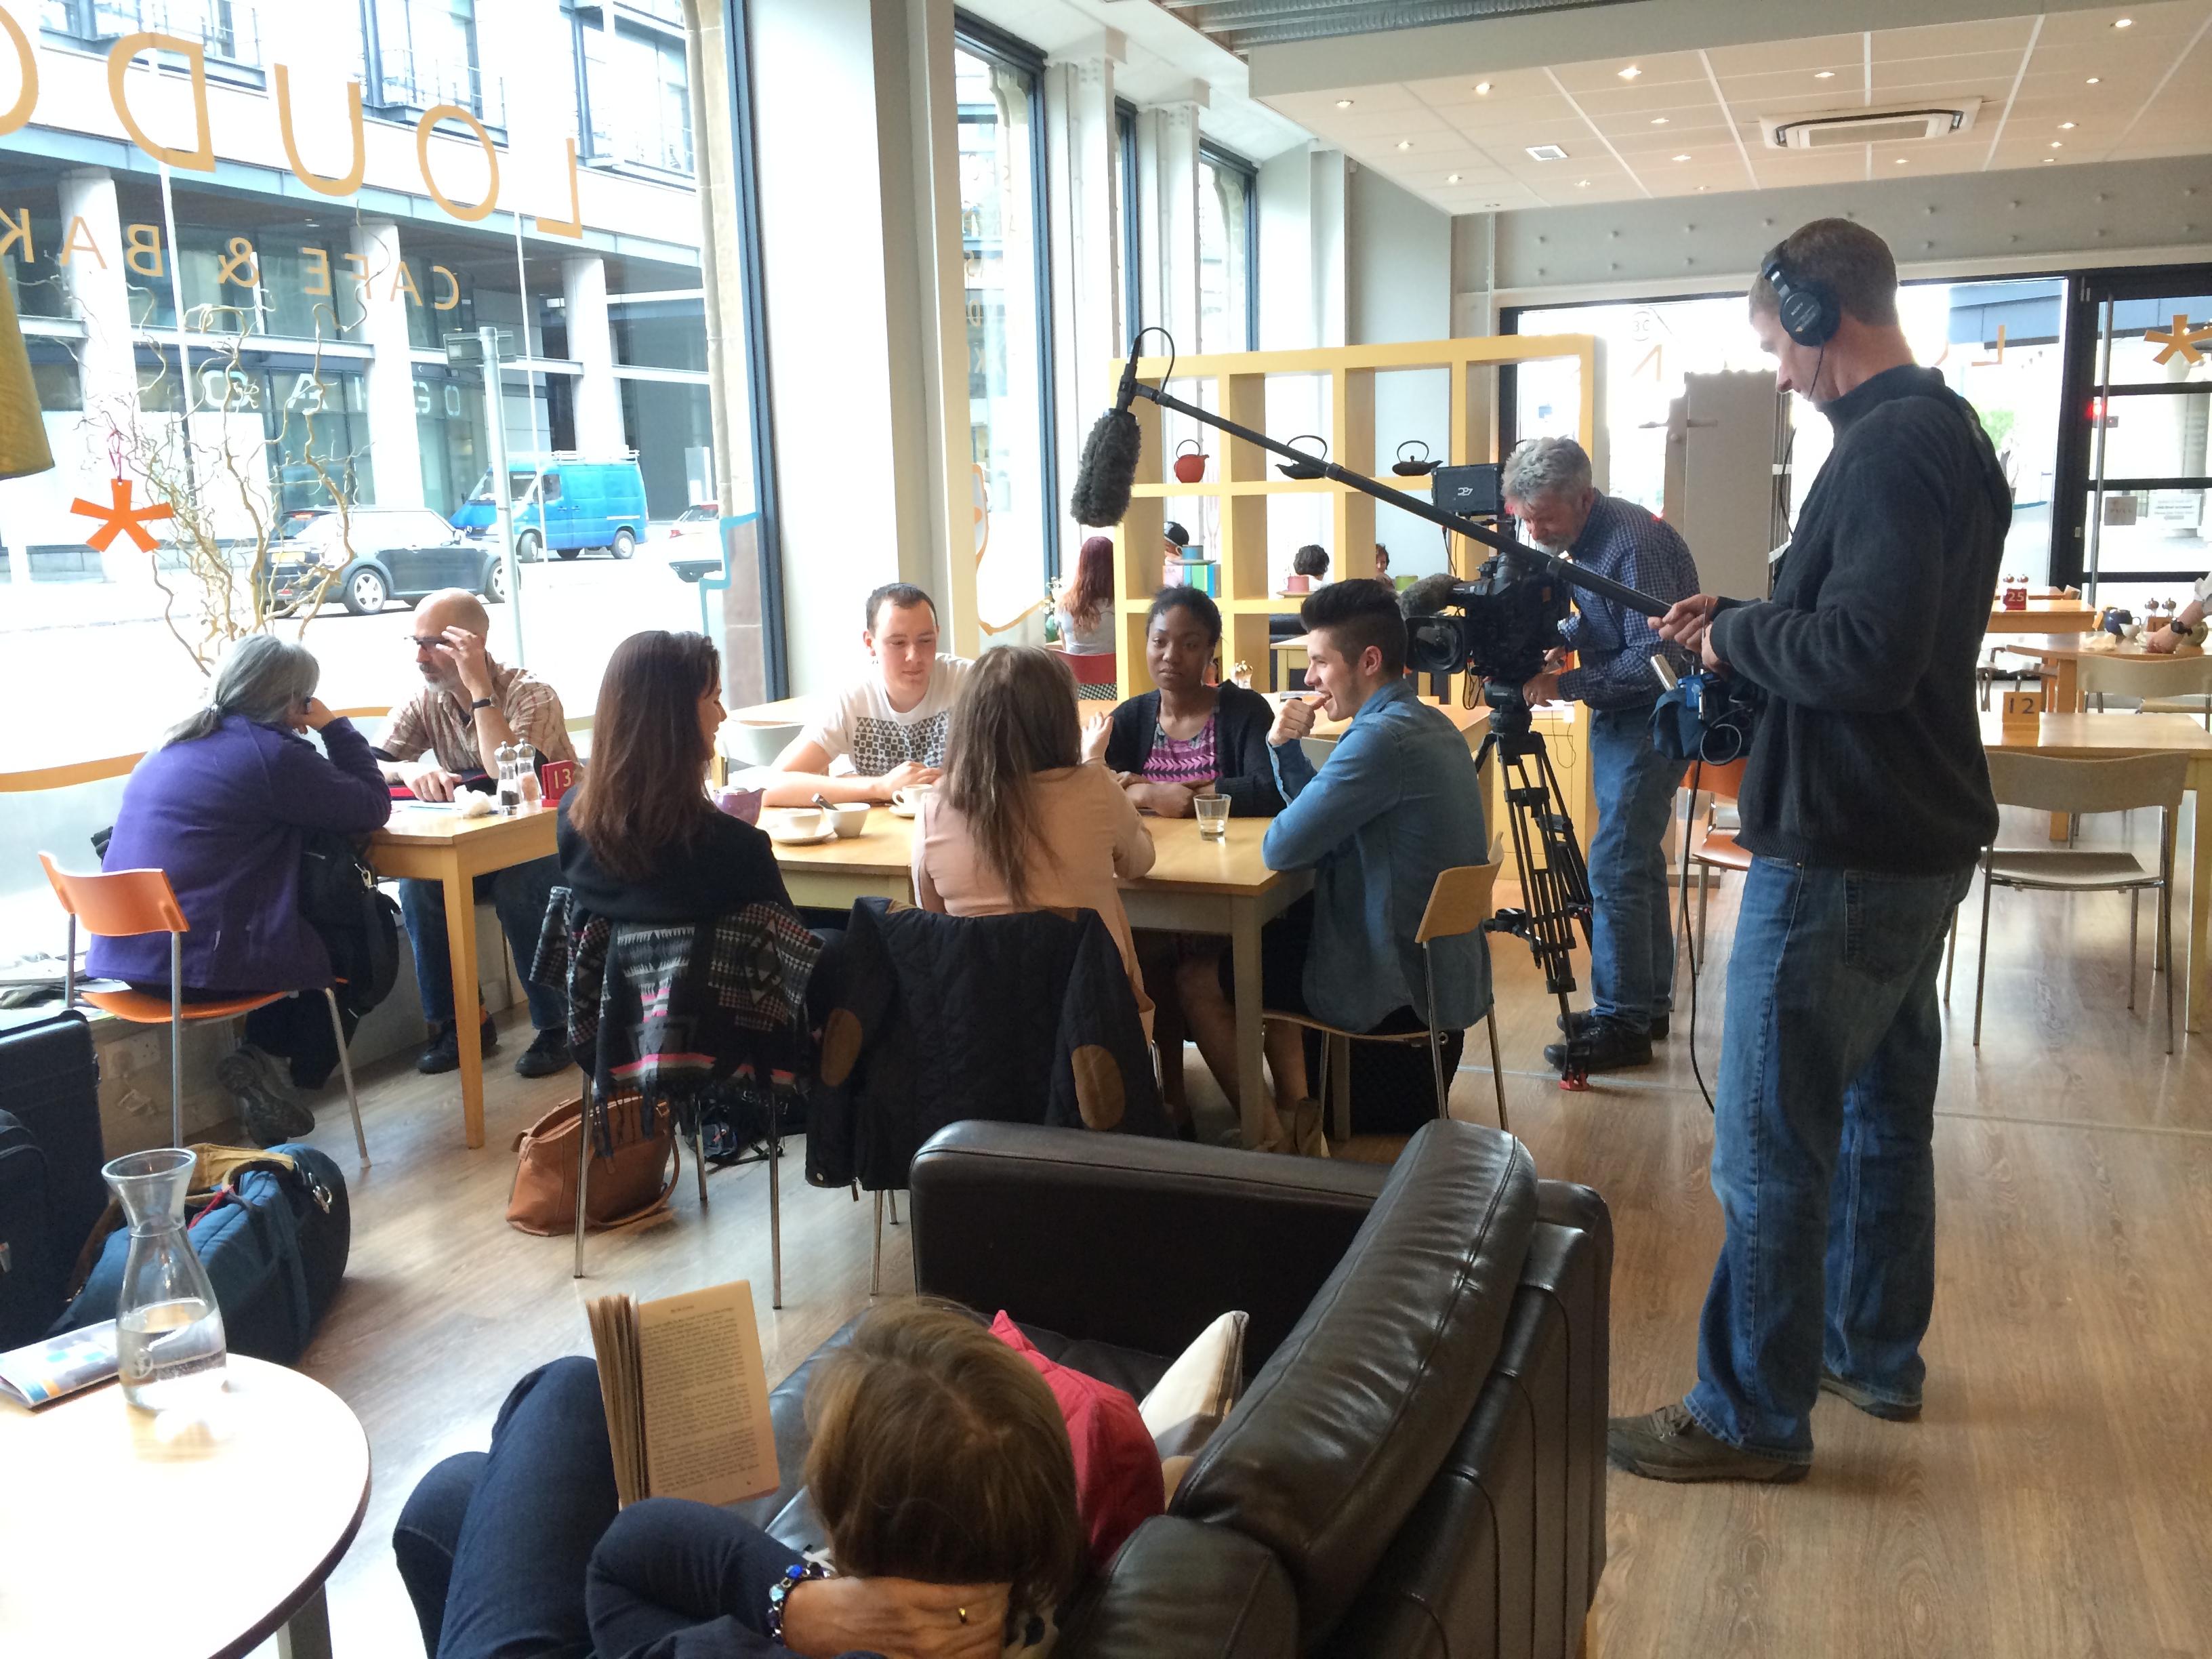 The 'student' scene is shot in Loudon Cafe, Fountainbridge.